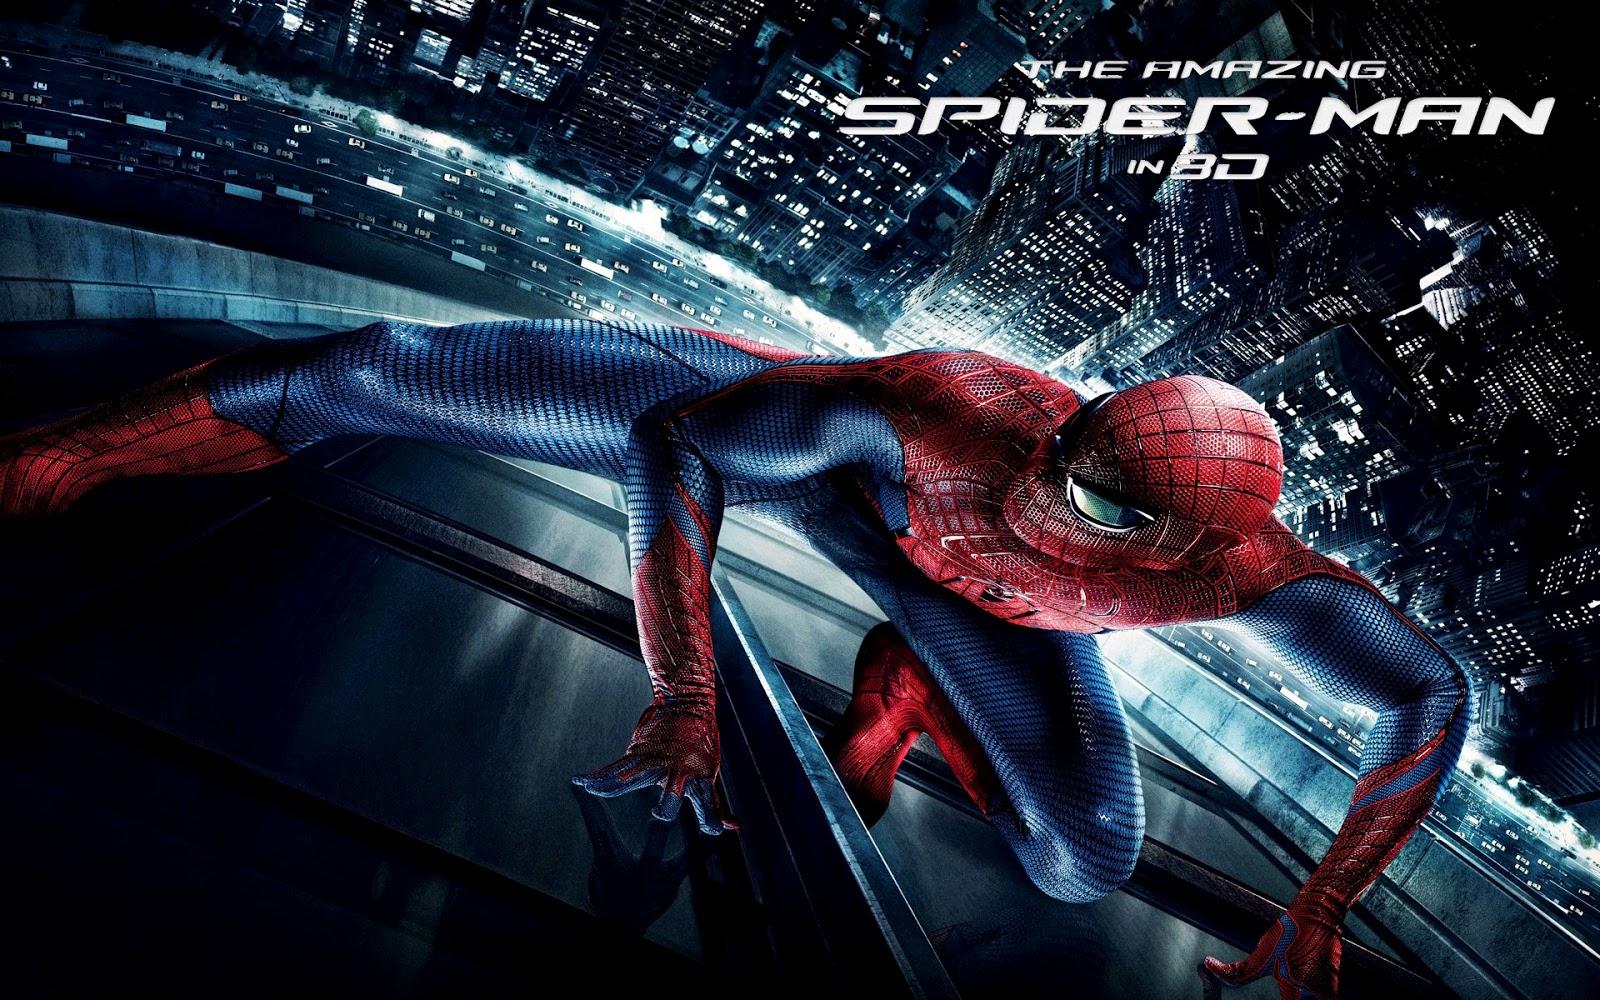 http://1.bp.blogspot.com/-t0viZ1Nq94g/T55jkMUbocI/AAAAAAAAFt0/kOvf5gGAImk/s1600/The_Amazing_Spider-Man_on_Skyscaper_Glass_HD_Movie_Wallpaper-Vvallpaper.Net.jpg